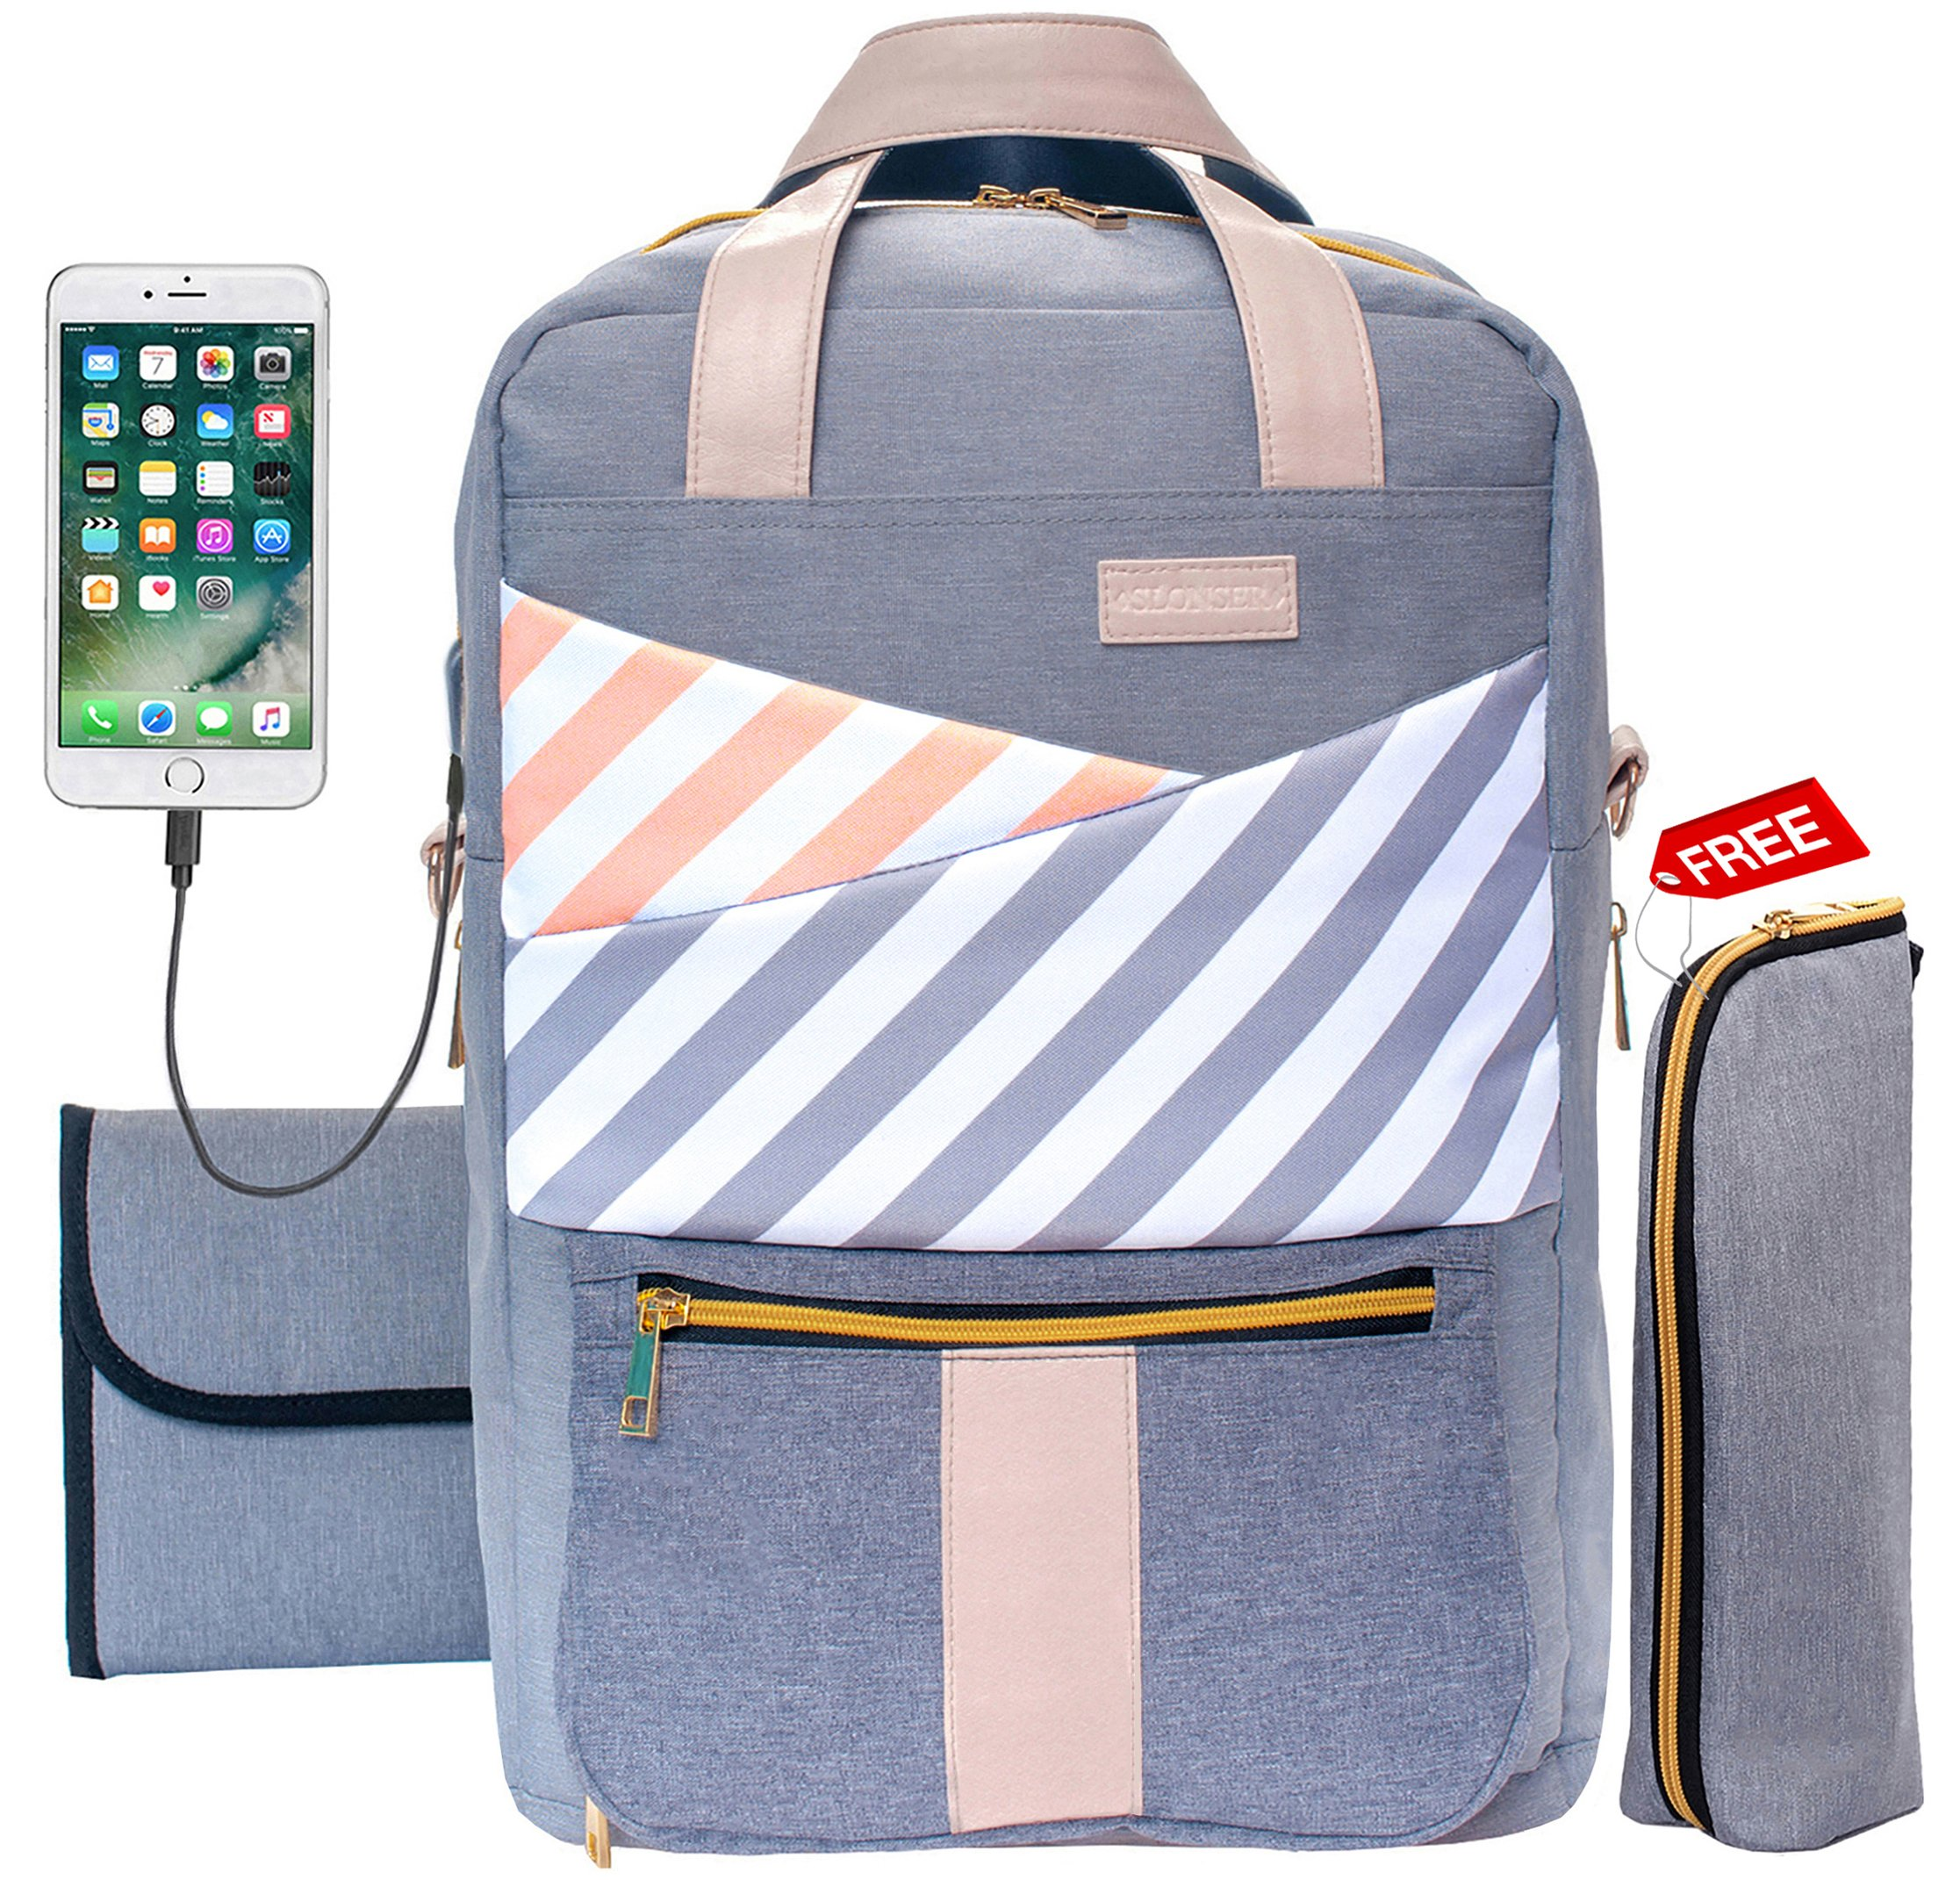 70ddba163e89a Get Quotations · Baby Diaper Bag Backpack Slonser Large Designer  Multifunction Maternity Nappy Tote Bag Organizer Waterproof Travel Nursing